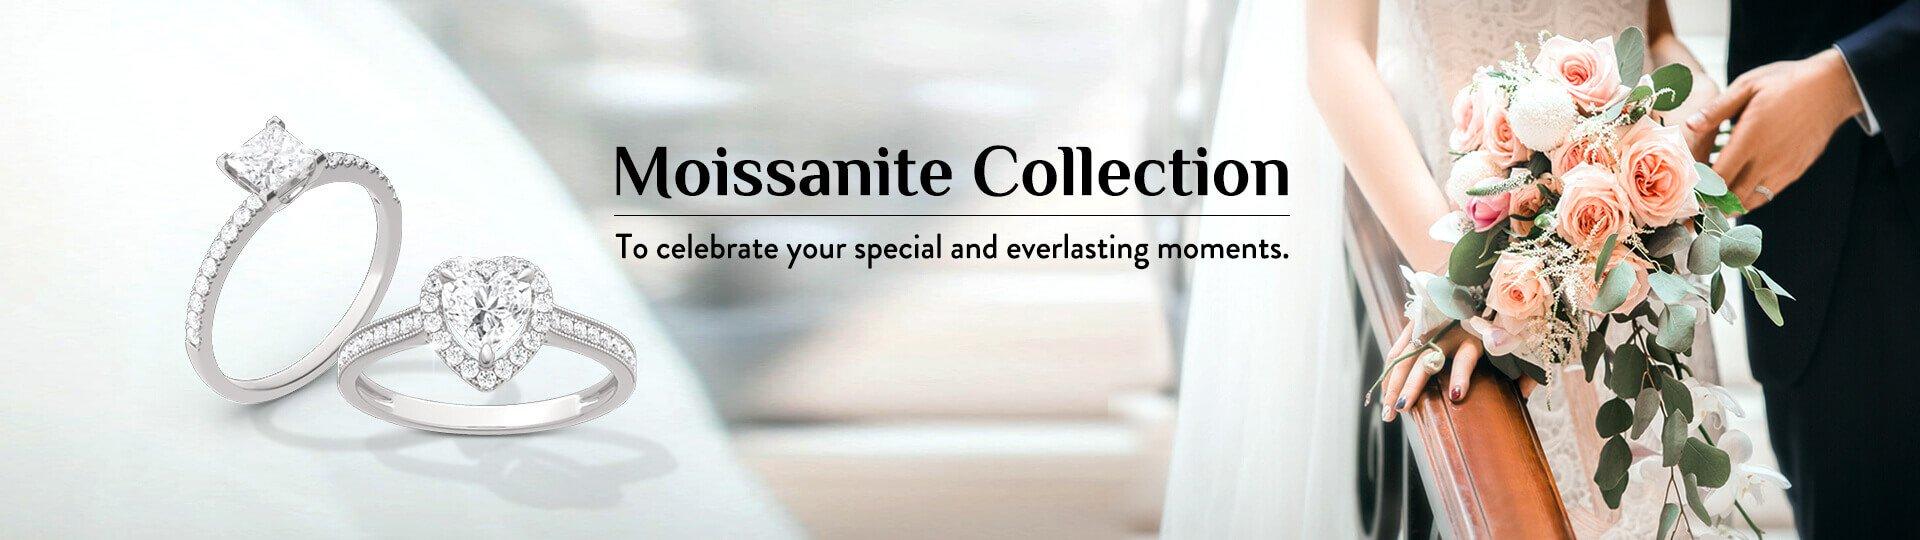 Jeulia Moissanite Collection